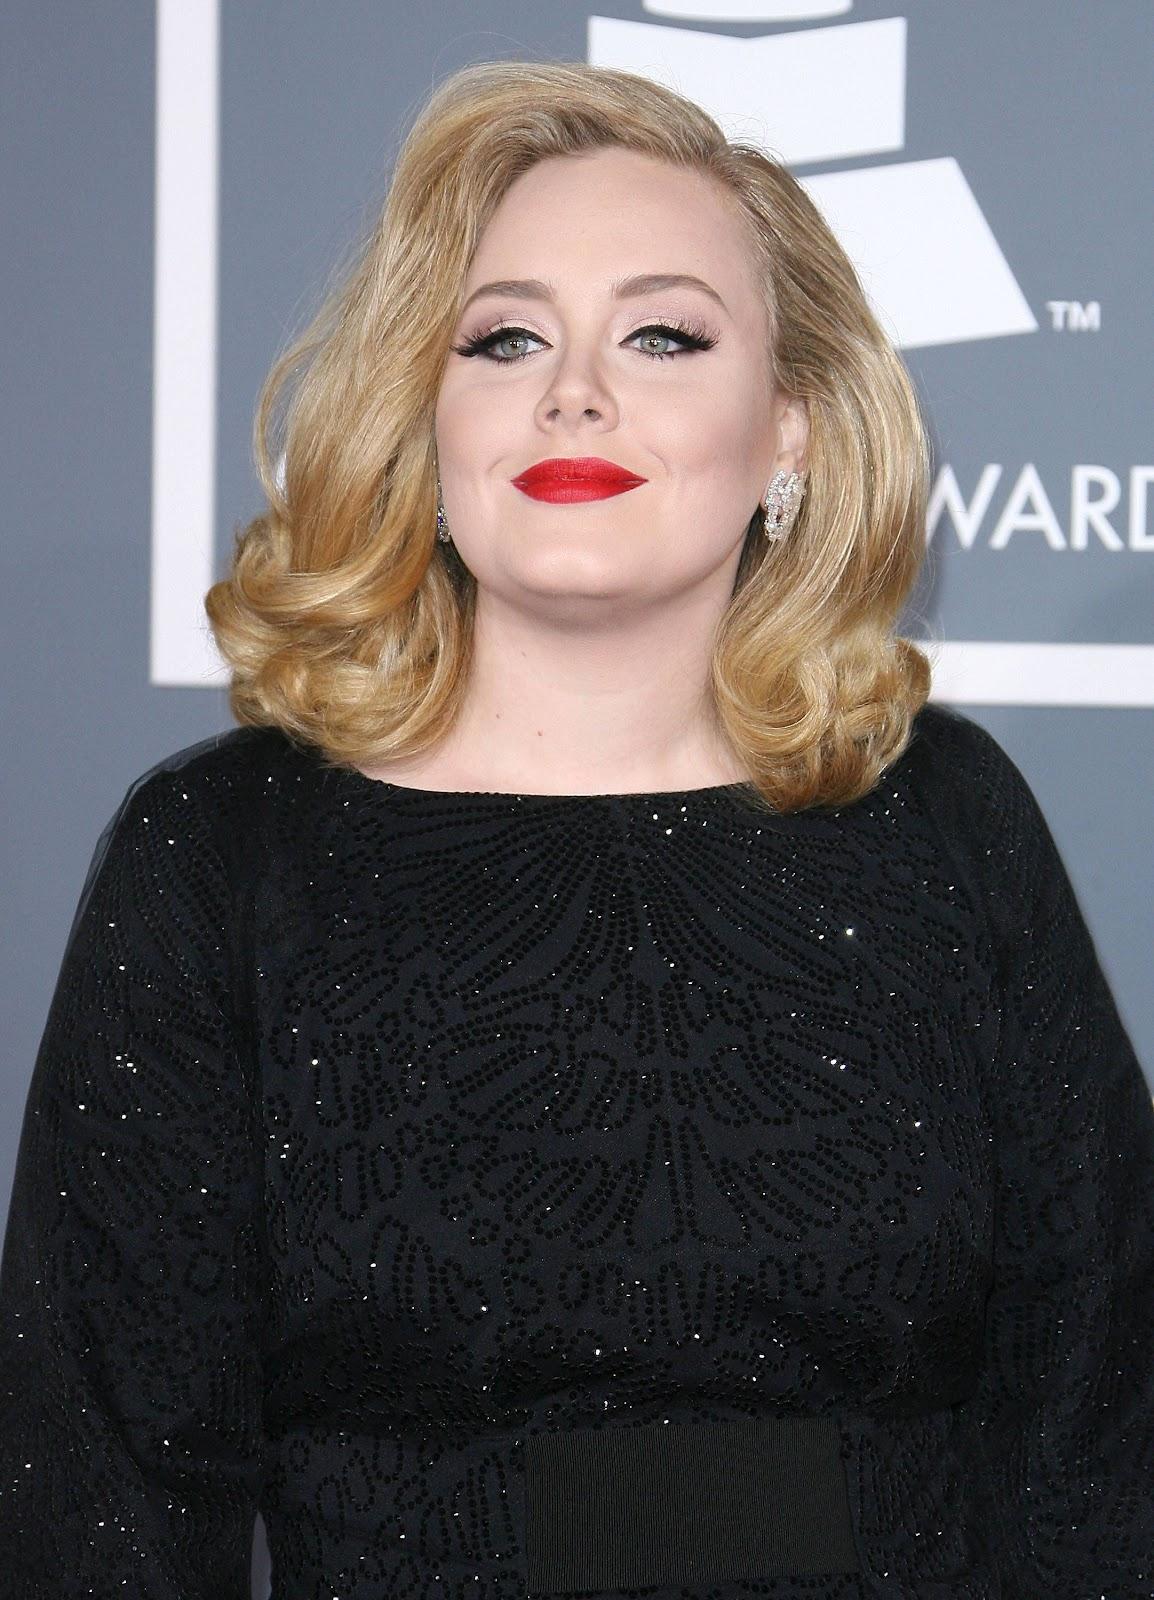 http://4.bp.blogspot.com/-wMwuH9wkdnI/Tzse5obFMTI/AAAAAAAAHRU/SiiOITXu7Eo/s1600/2012+Adele+Hairstyles+15.jpg